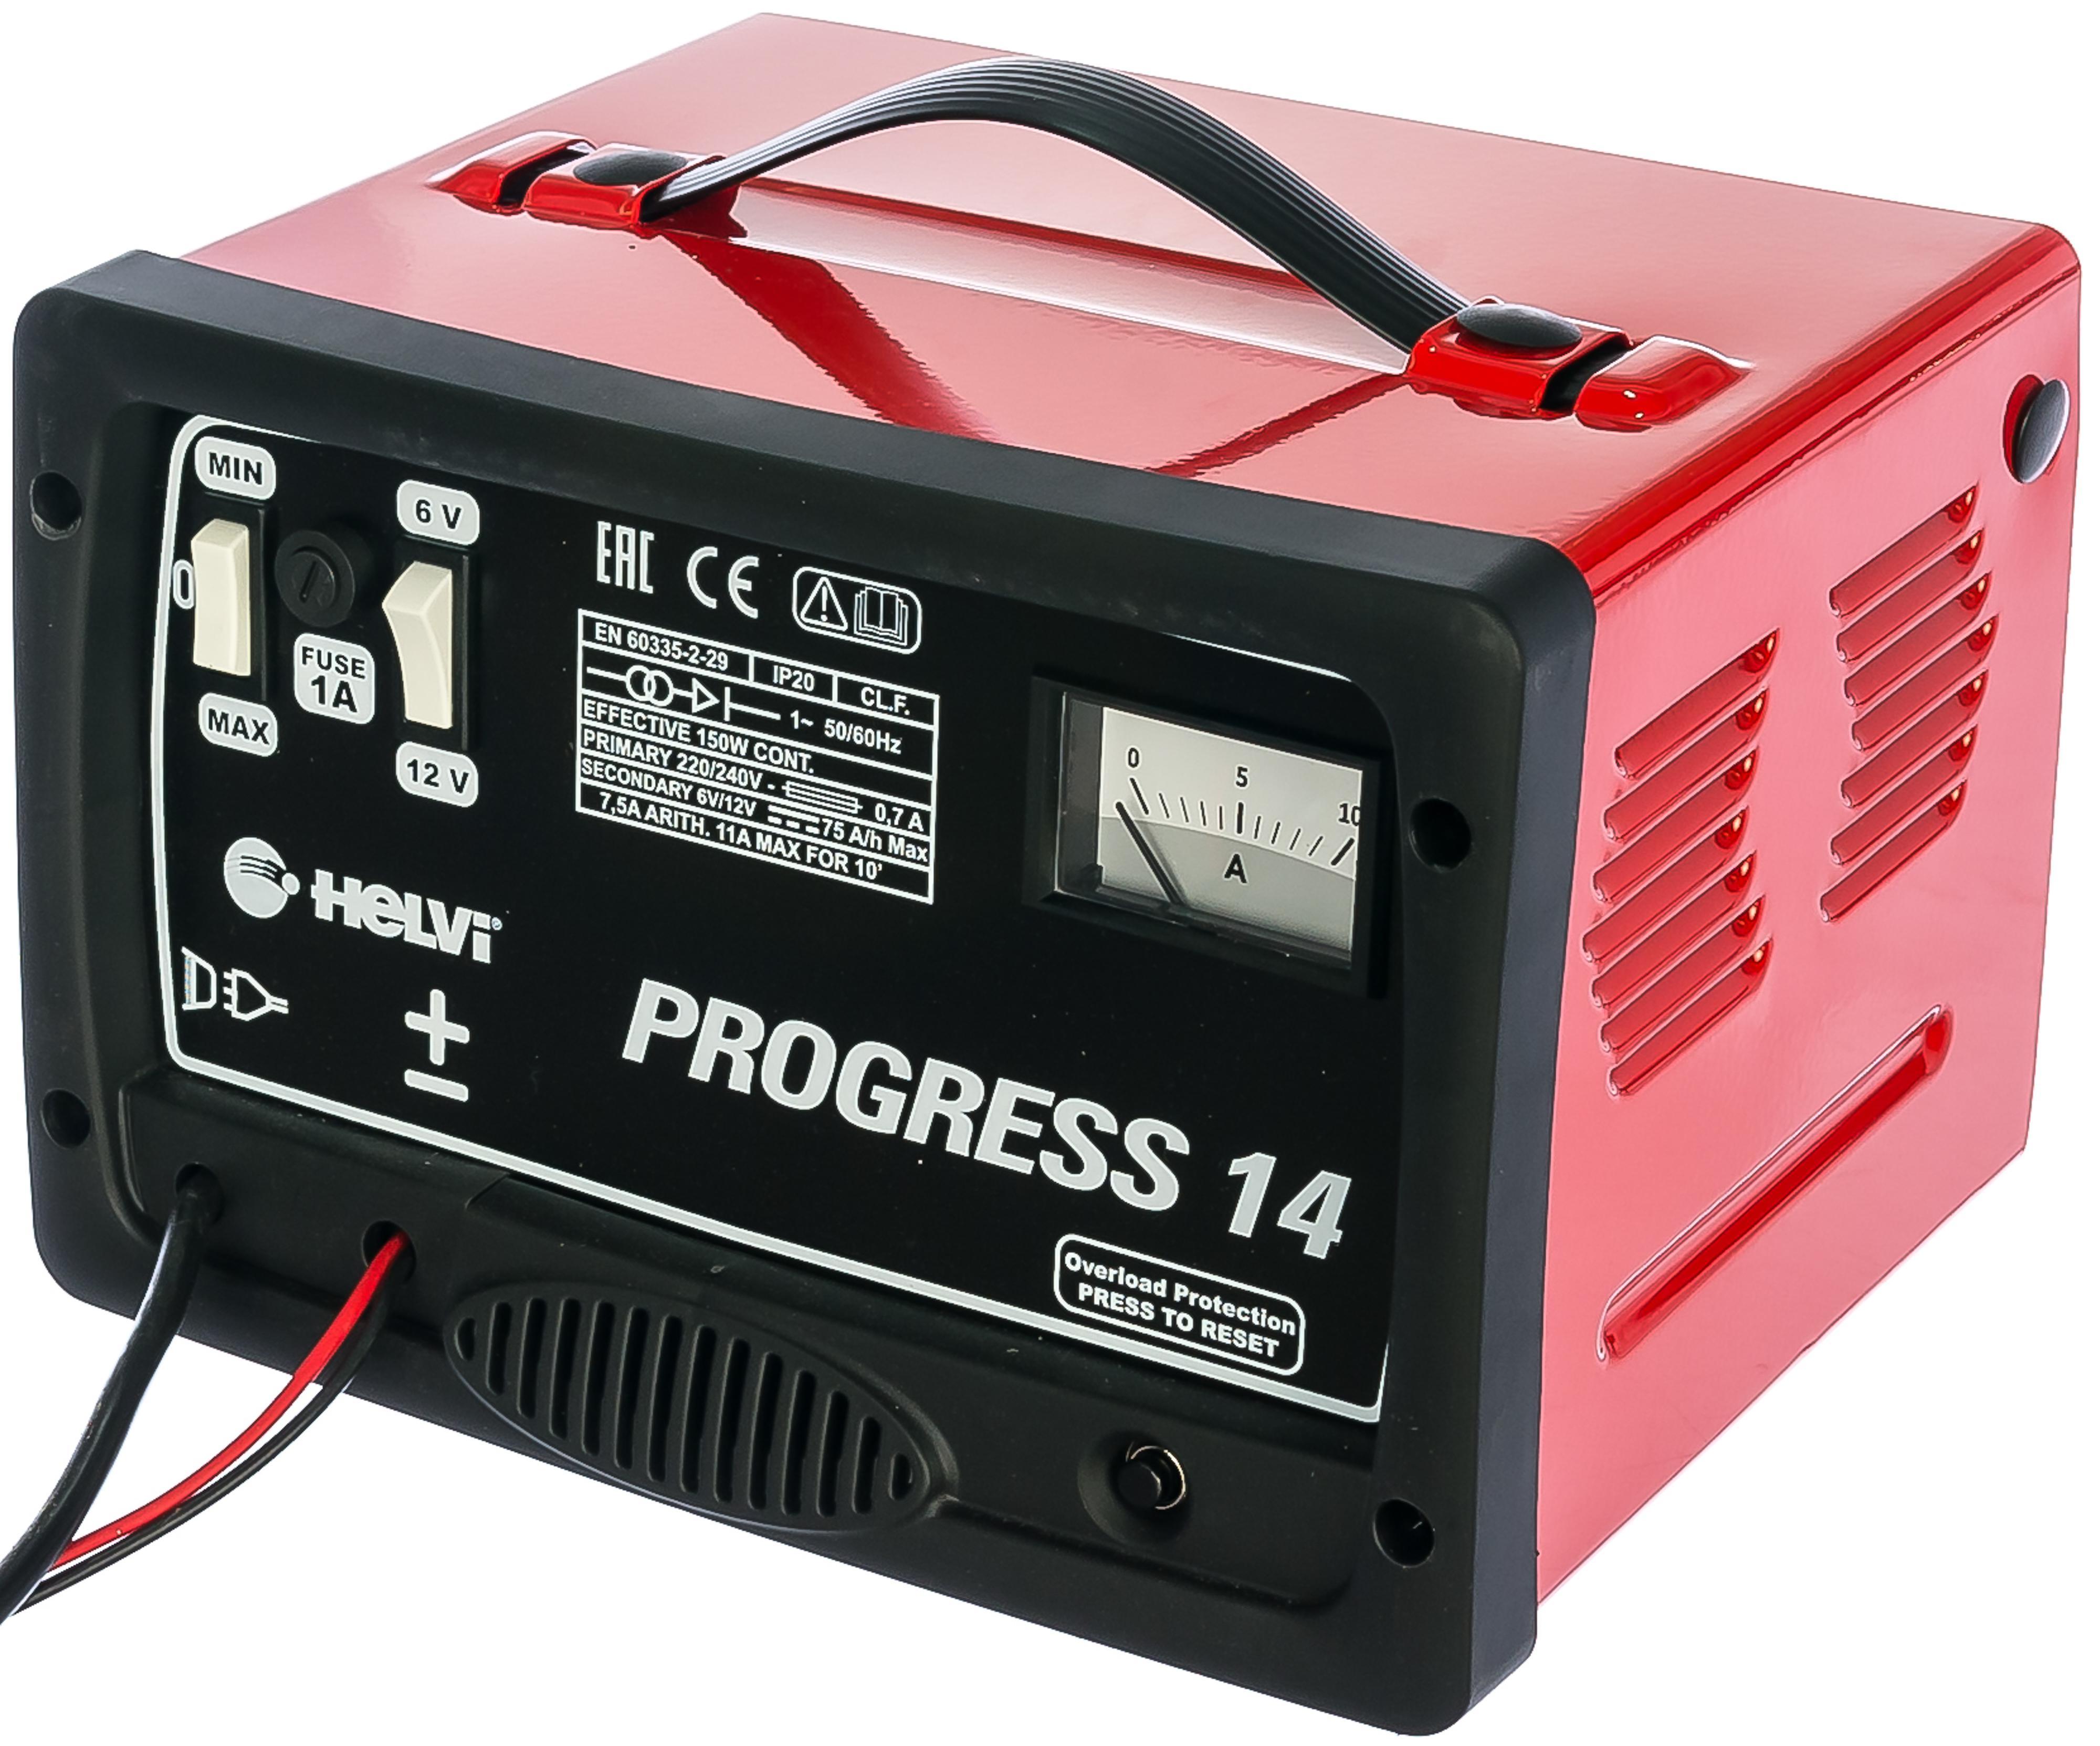 Зарядное устройство Helvi Progress 14 зарядное устройство helvi progress 17